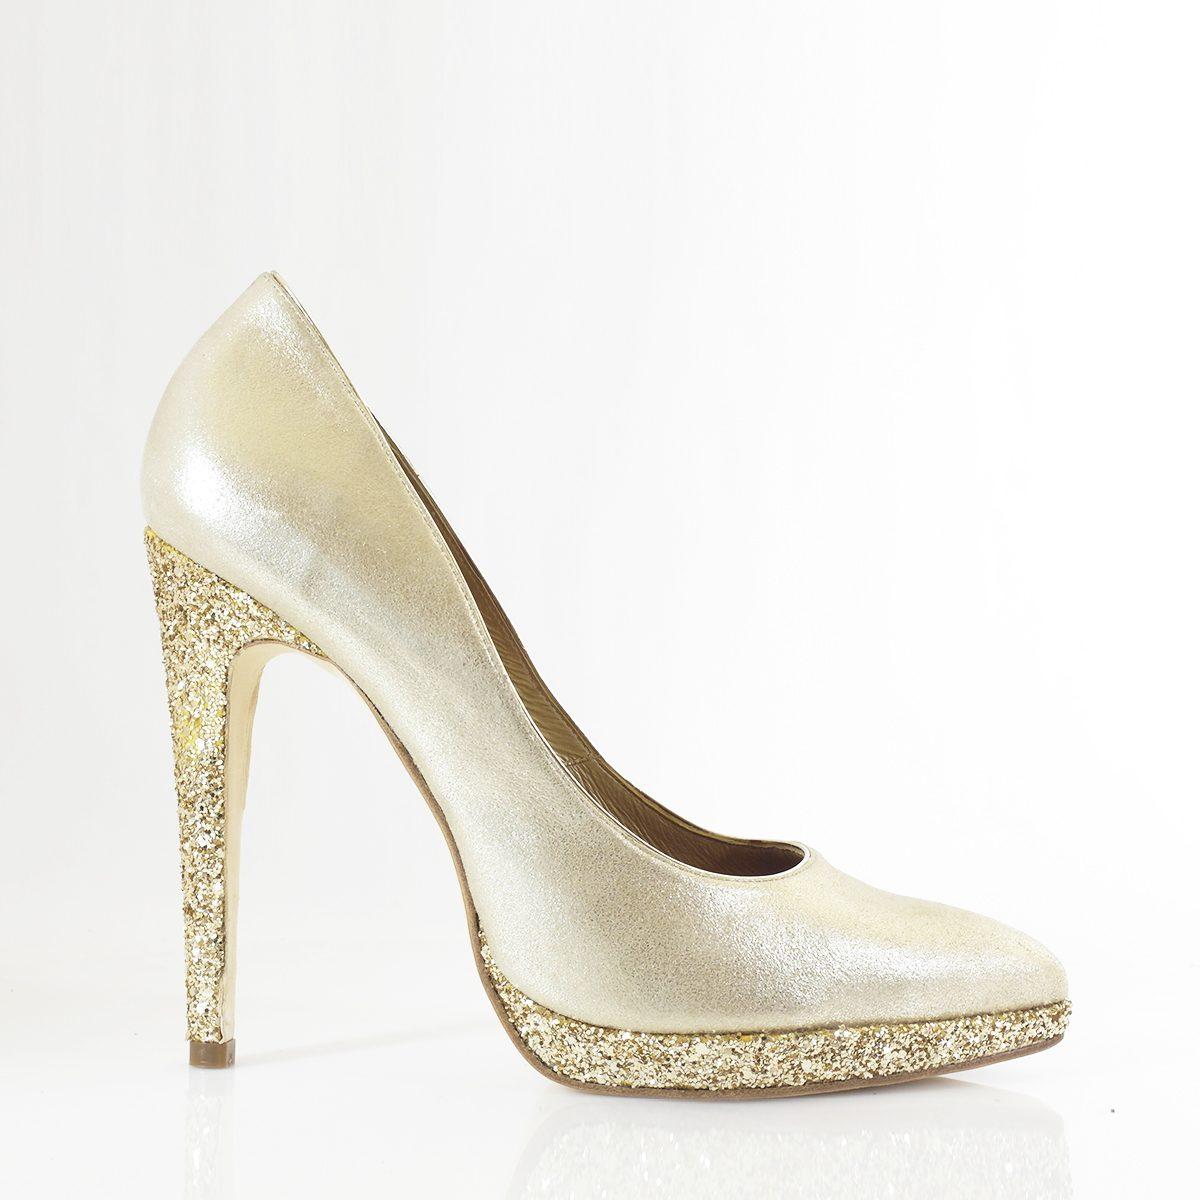 SALON MOD.1833 (13cm) - Zapatos Personalizados fiesta